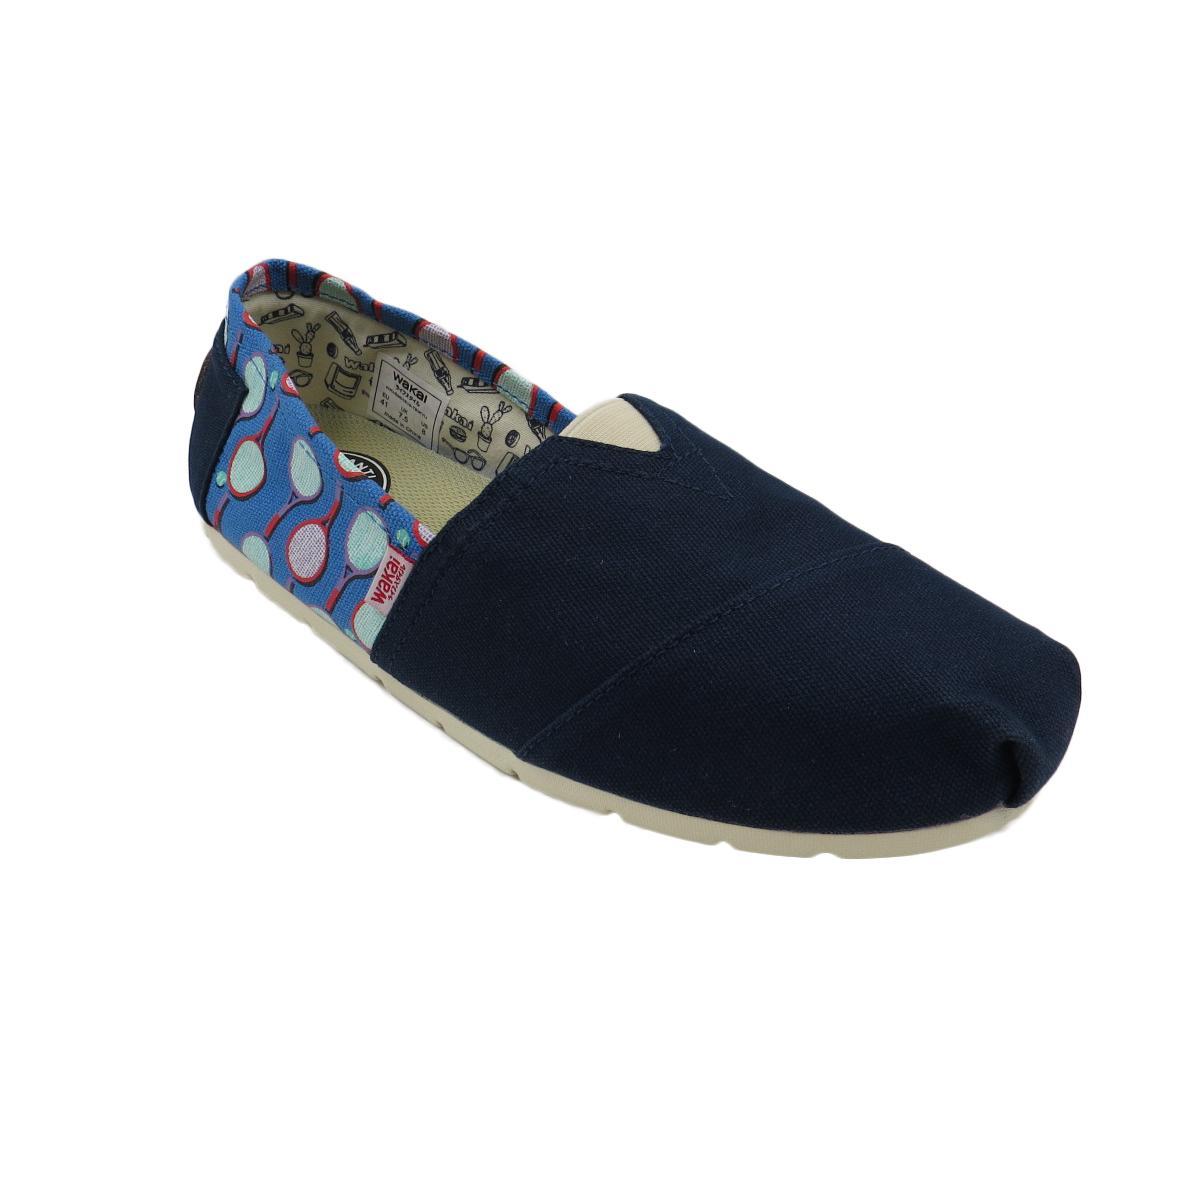 Wakai Teikyu Men S Slip On Shoes Navy Price